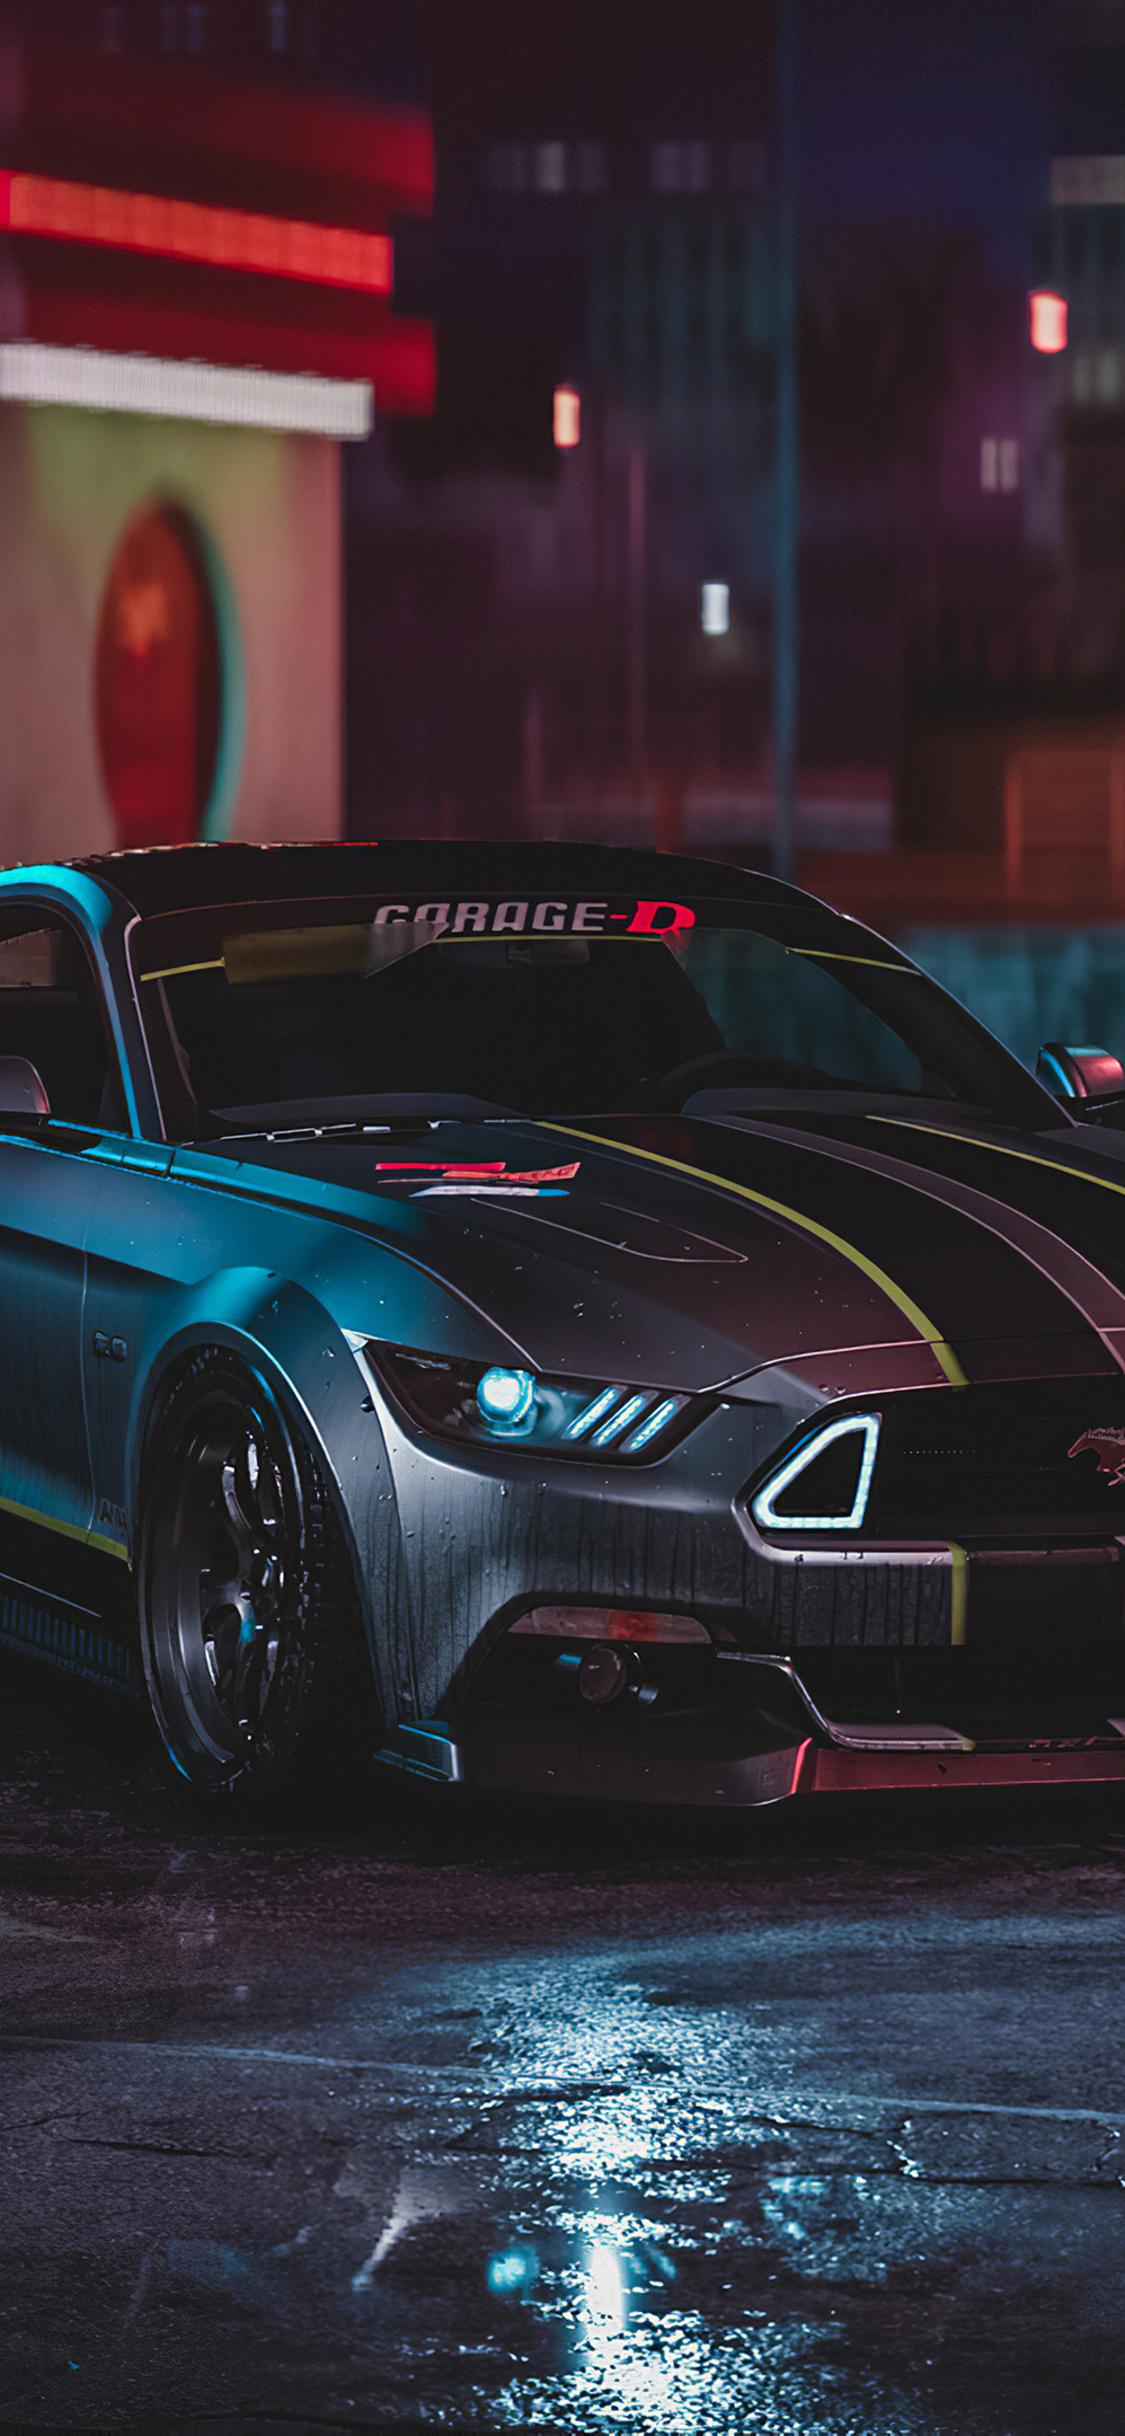 Mustang Wallpaper Iphone 8